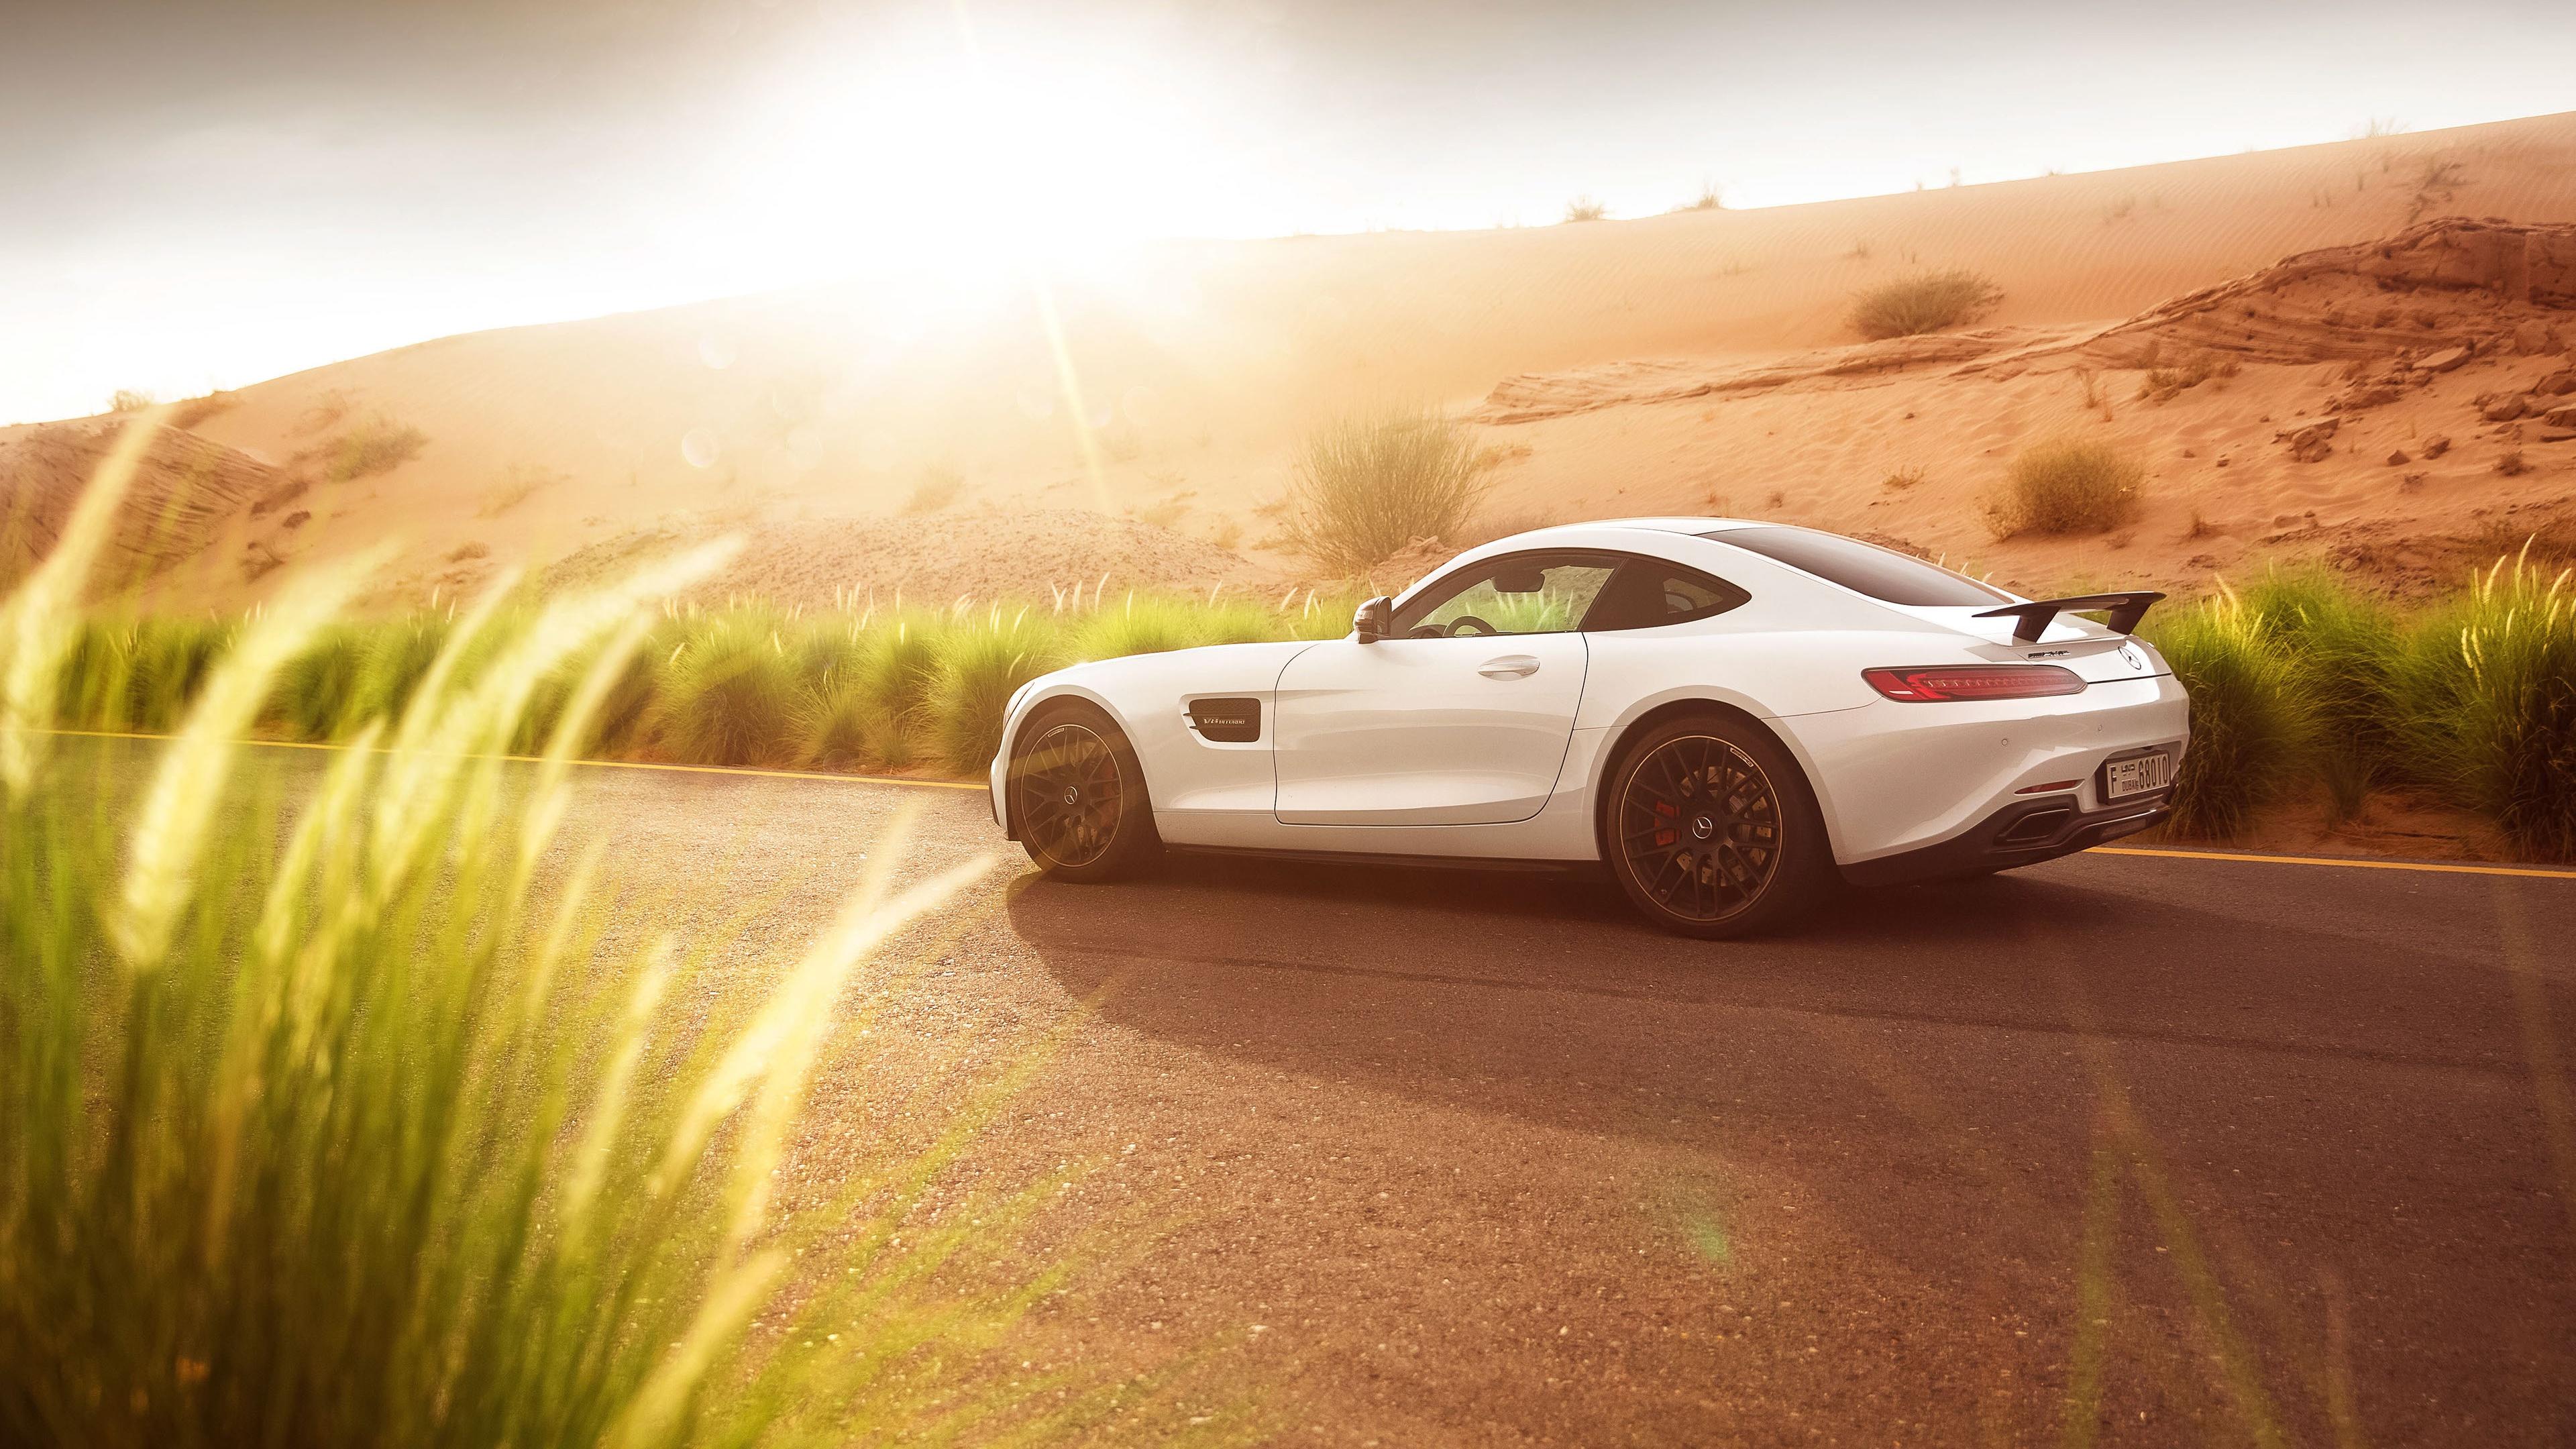 mercedes amg gt s supercar 4k 1539114262 - Mercedes AMG GT S Supercar 4k - mercedes wallpapers, mercedes amg gt wallpapers, hd-wallpapers, cars wallpapers, 4k-wallpapers, 2018 cars wallpapers